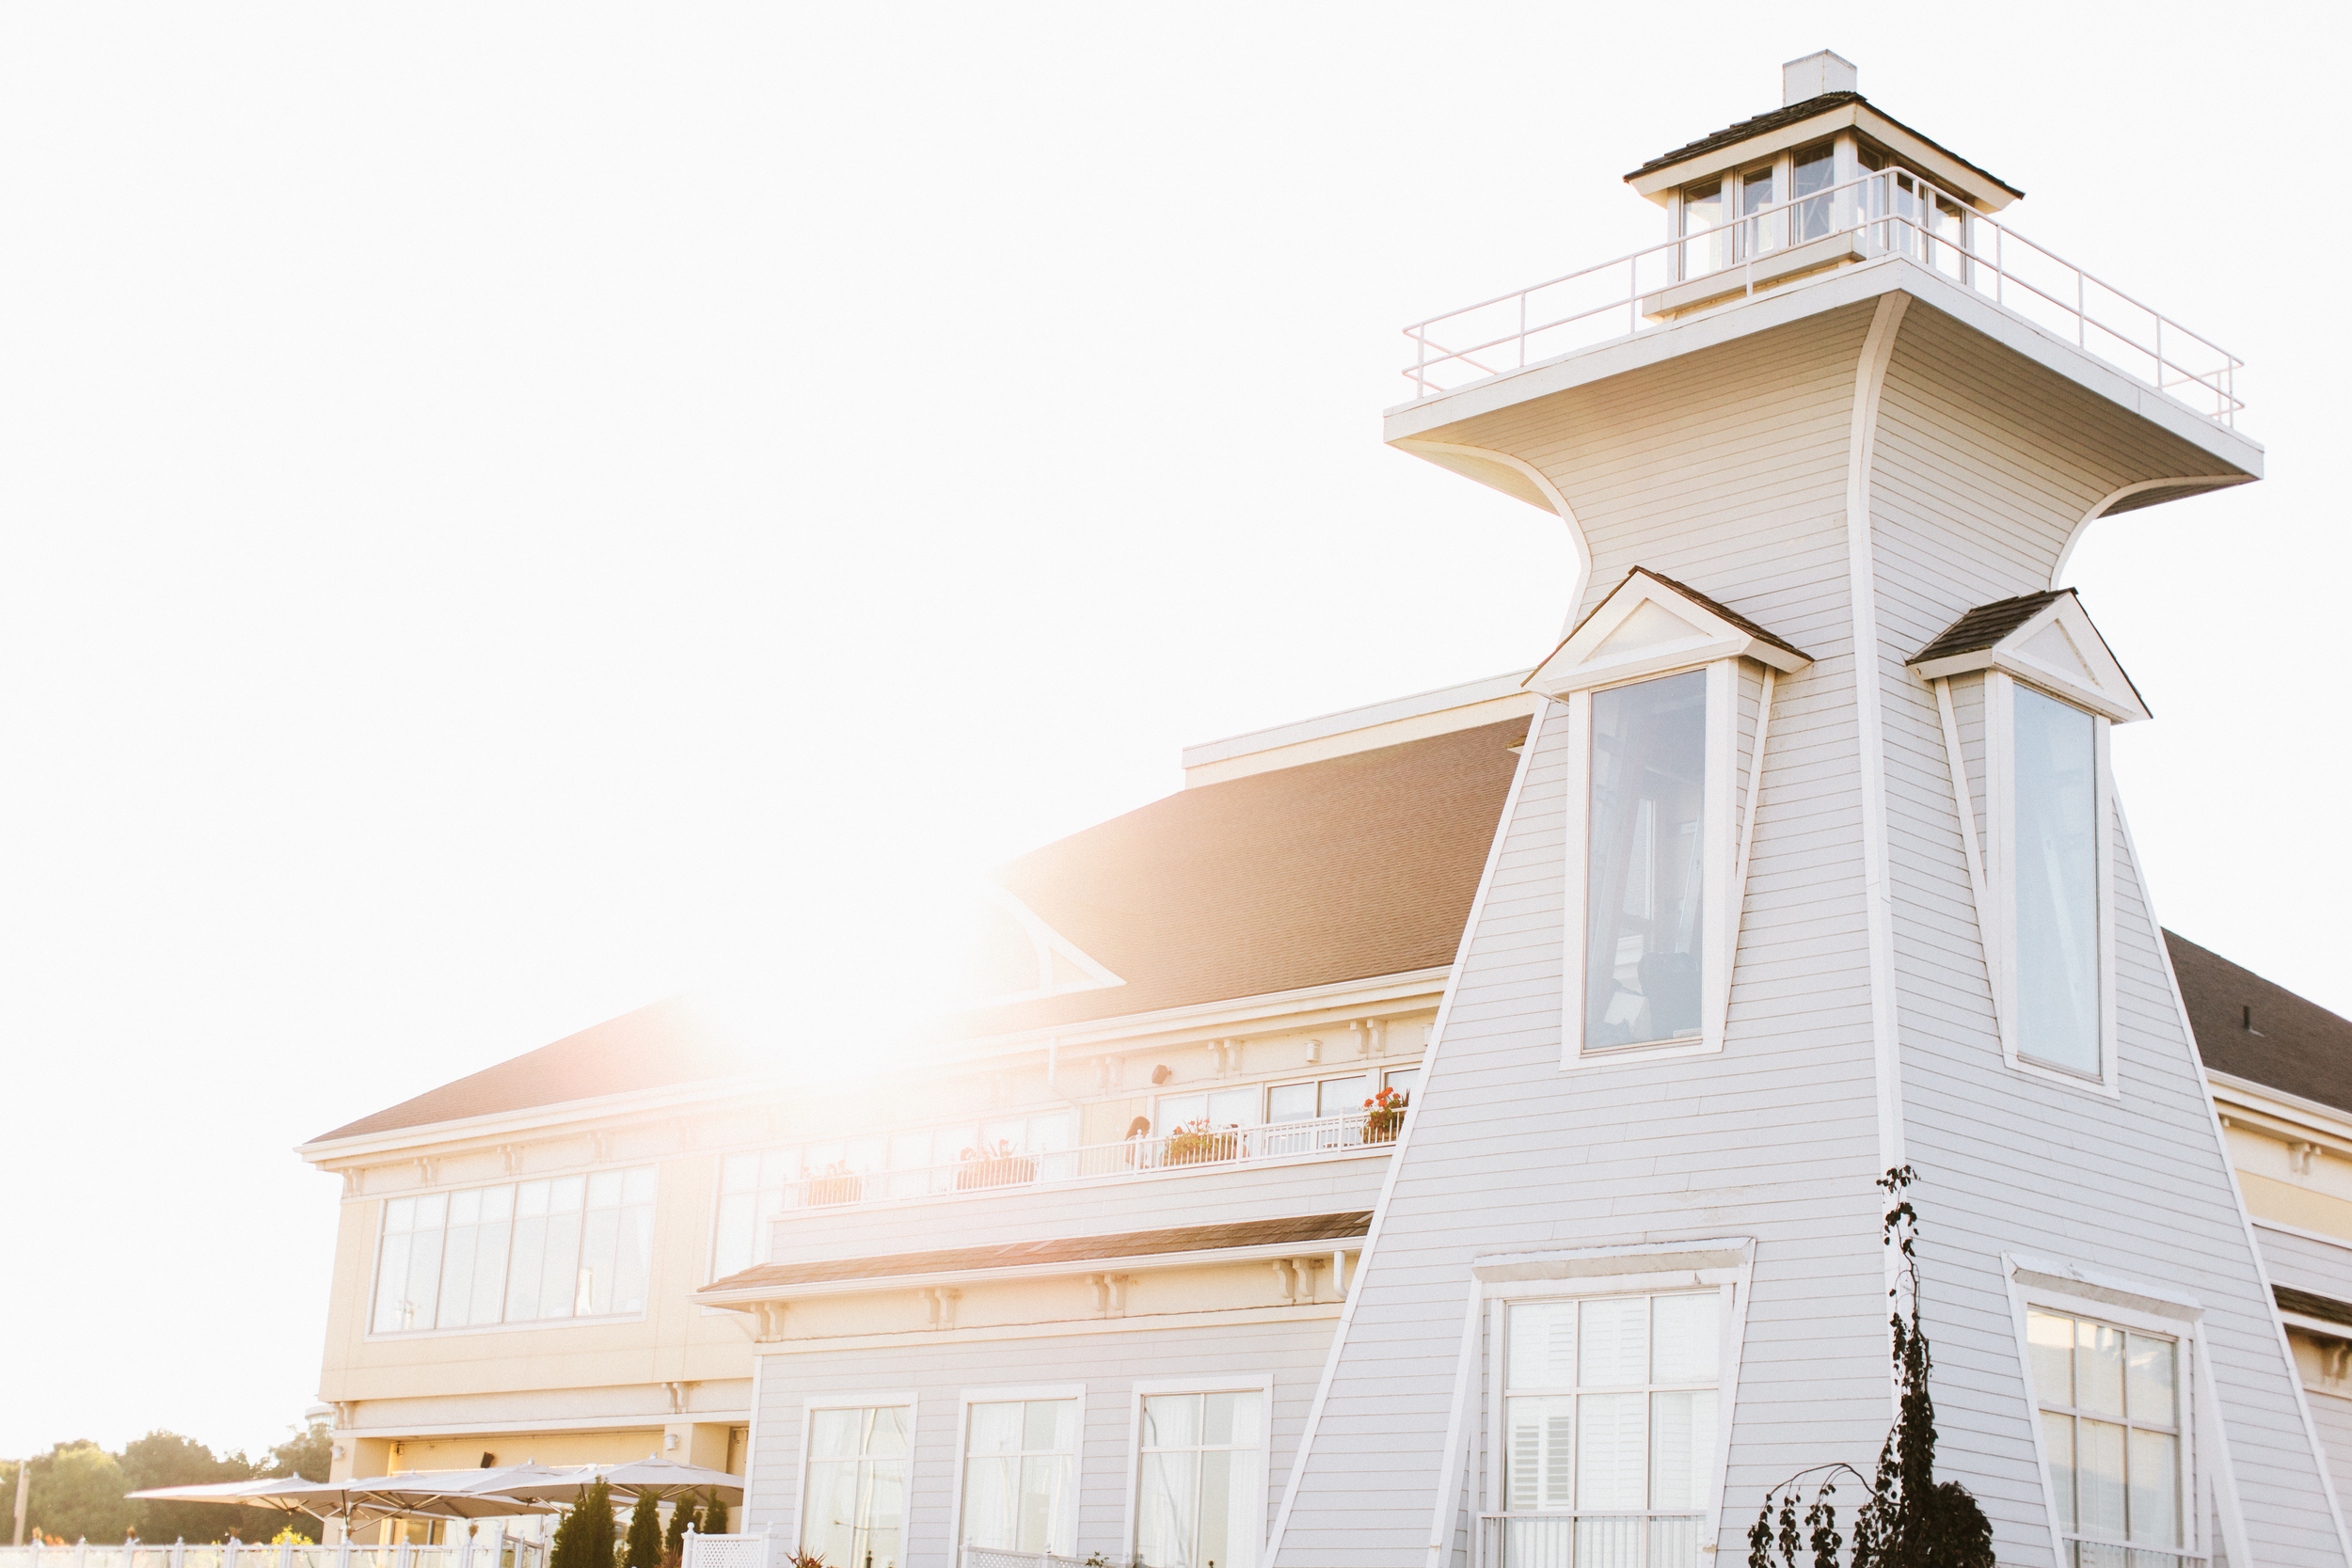 harbour-banquet-hall-oakville-wedding-photographer-michael-rousseau-photography-persian-wedding-photographer-isabella-daniel015.JPG